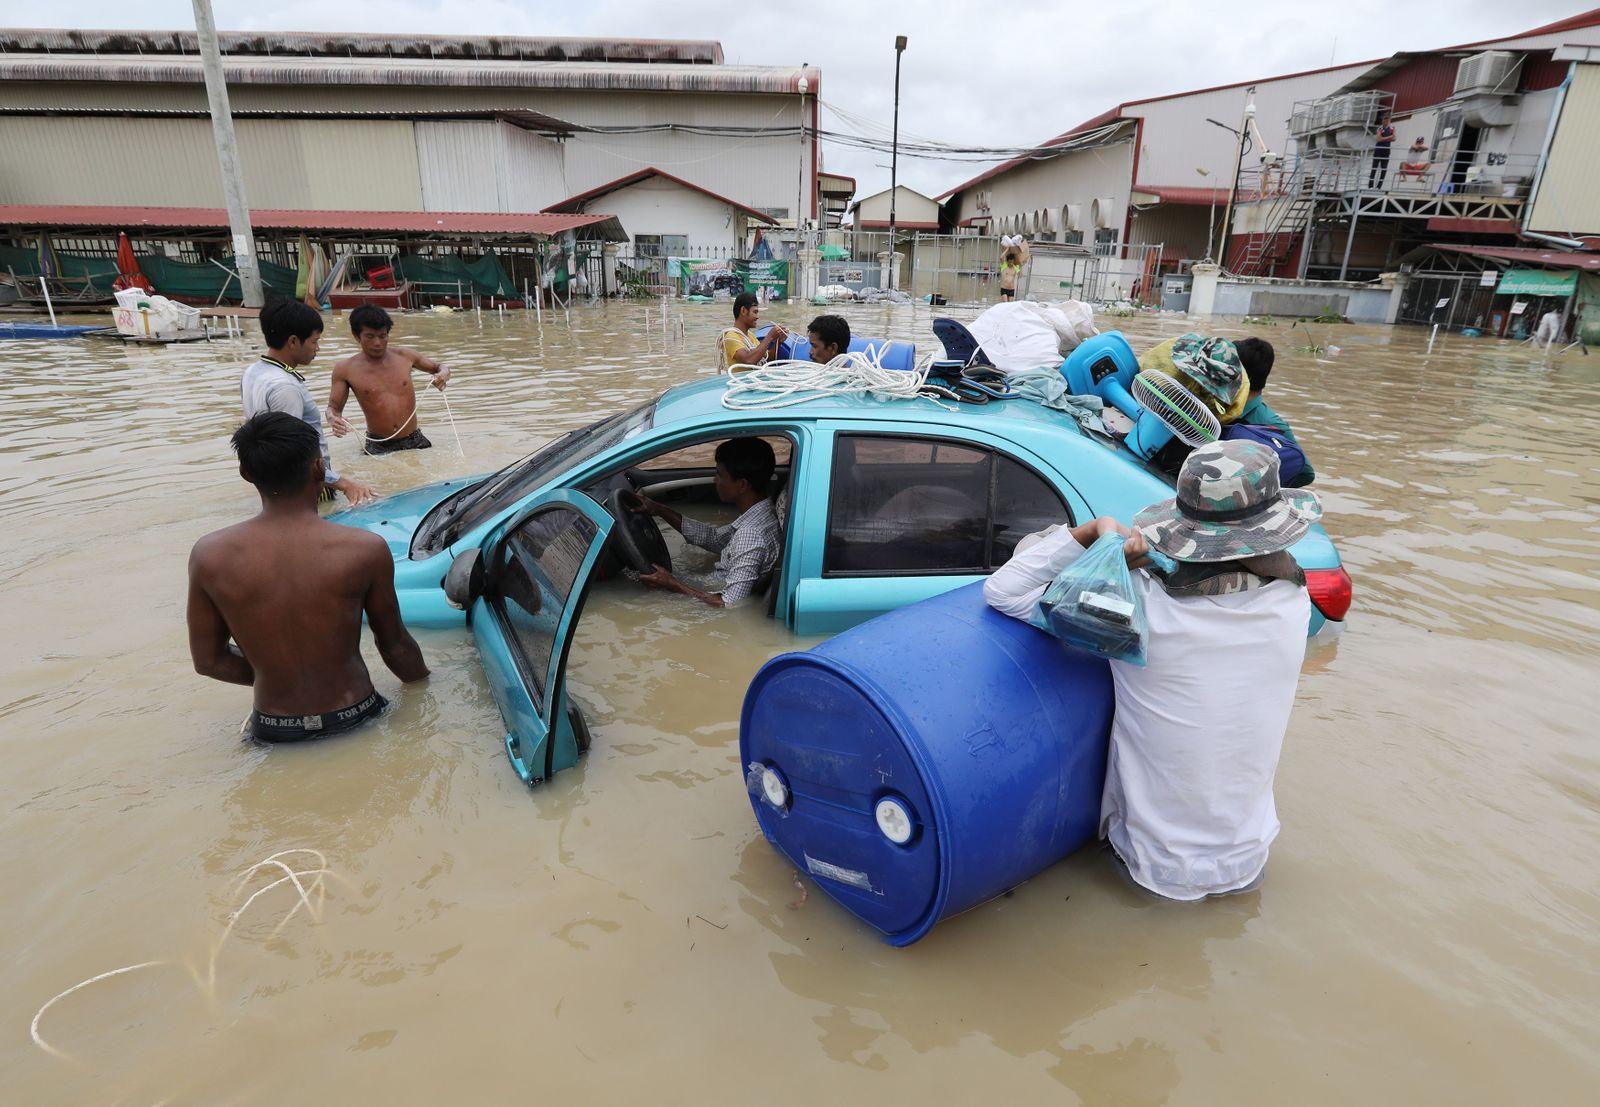 At least 18 killed, 20,000 evacuated in Cambodia floods, Phnom Penh - 16 Oct 2020